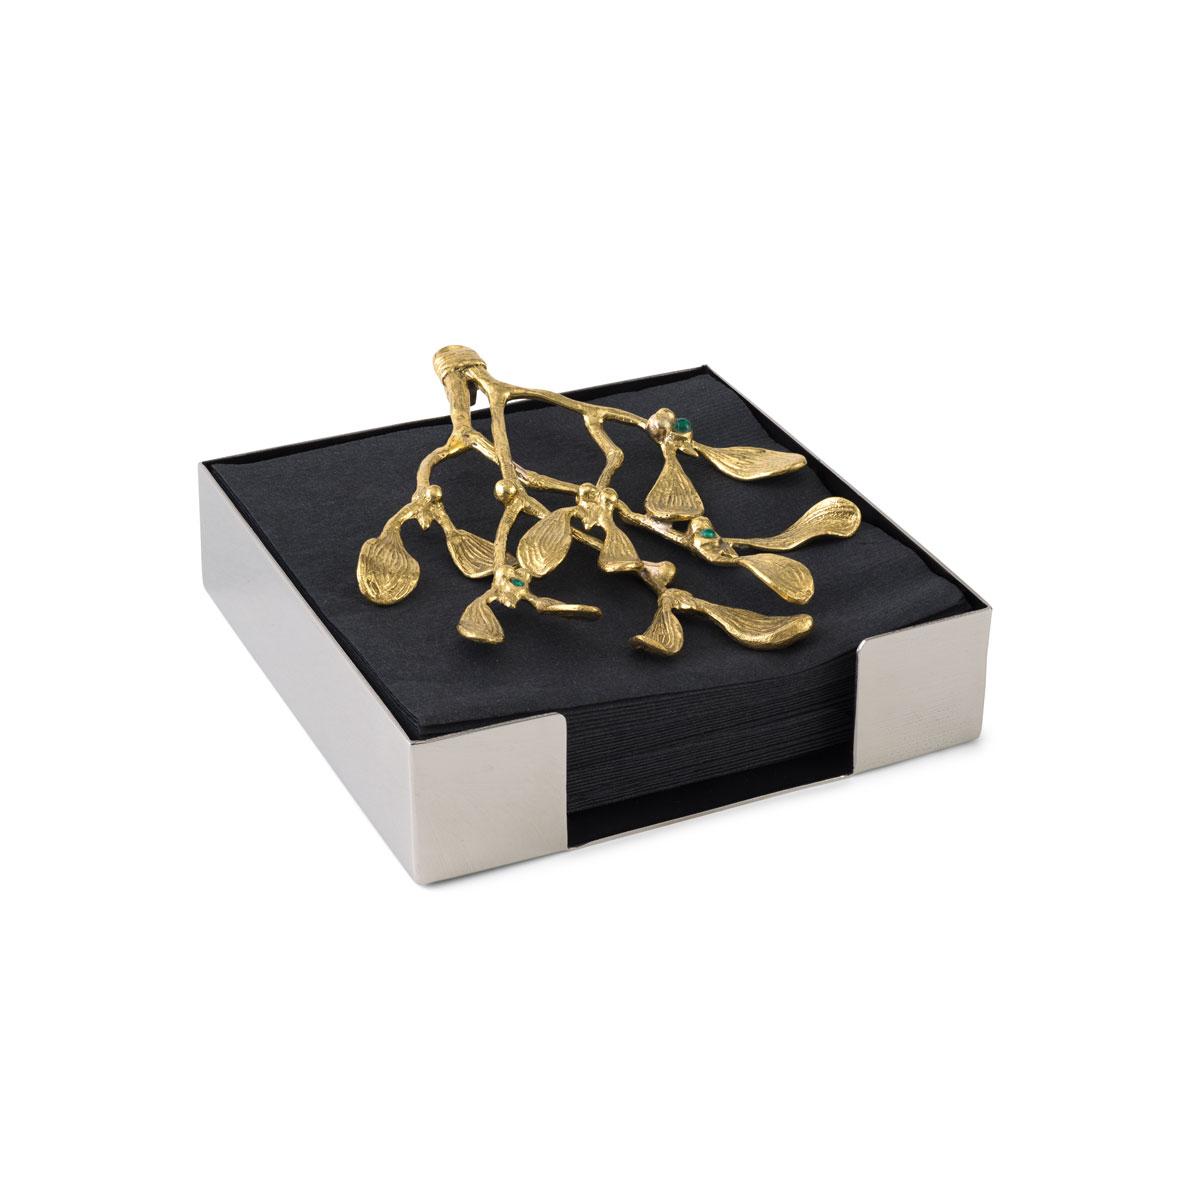 Michael Aram Mistletoe Cocktail Napkin Box